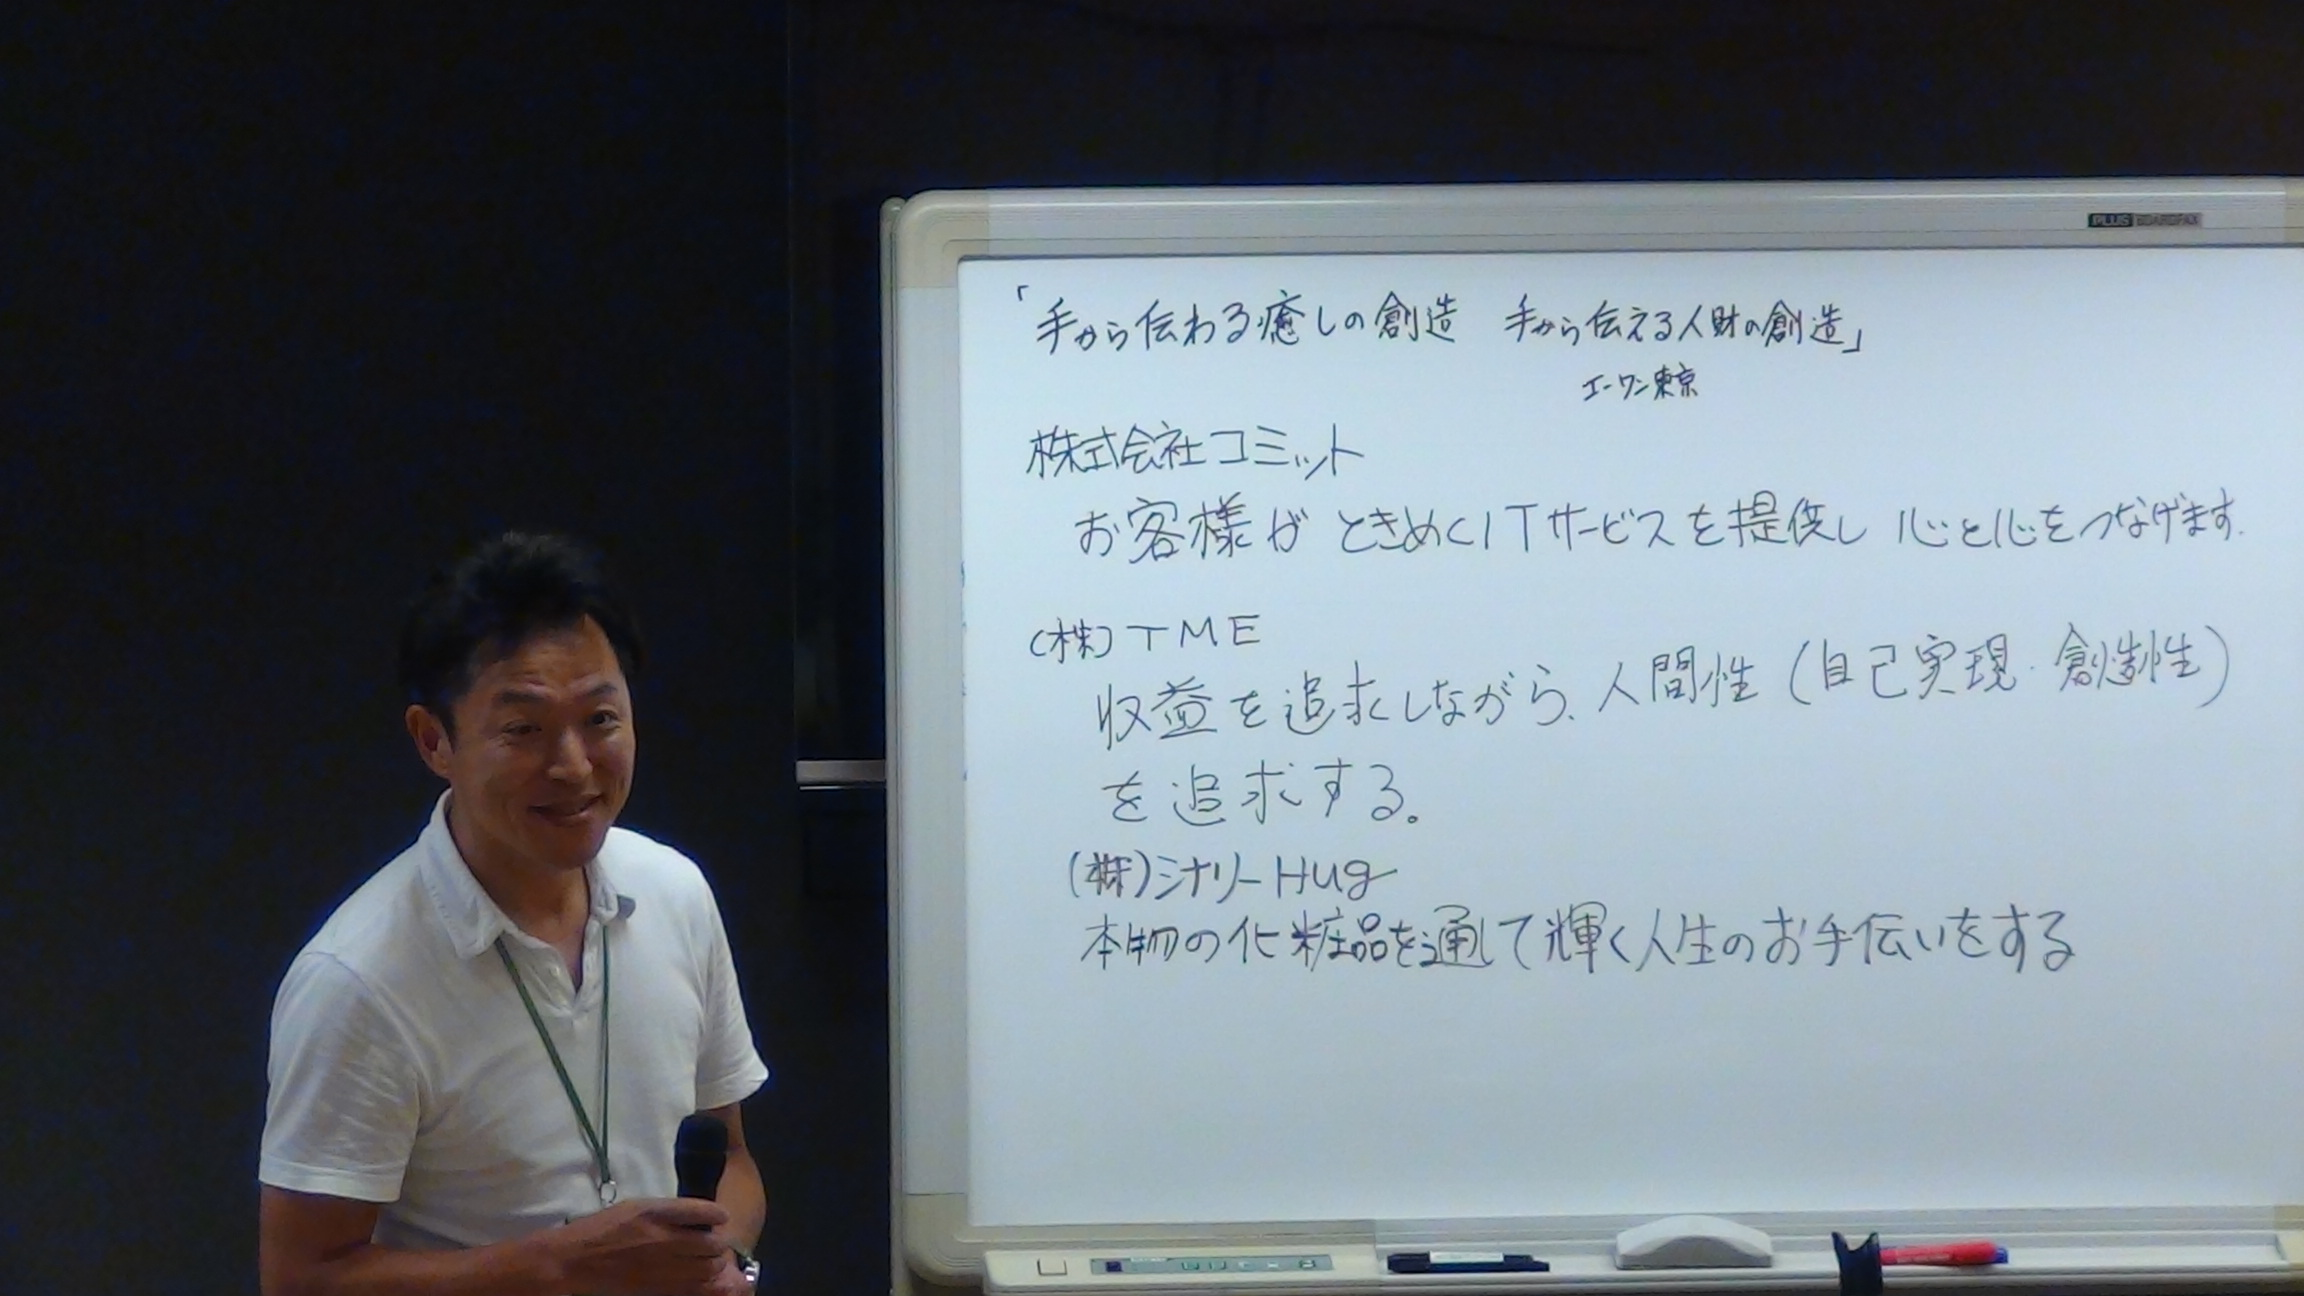 DSC00389 1 - 2017年8月5日東京思風塾「心が燃える理念とは〜自社の理念を問い直す〜」